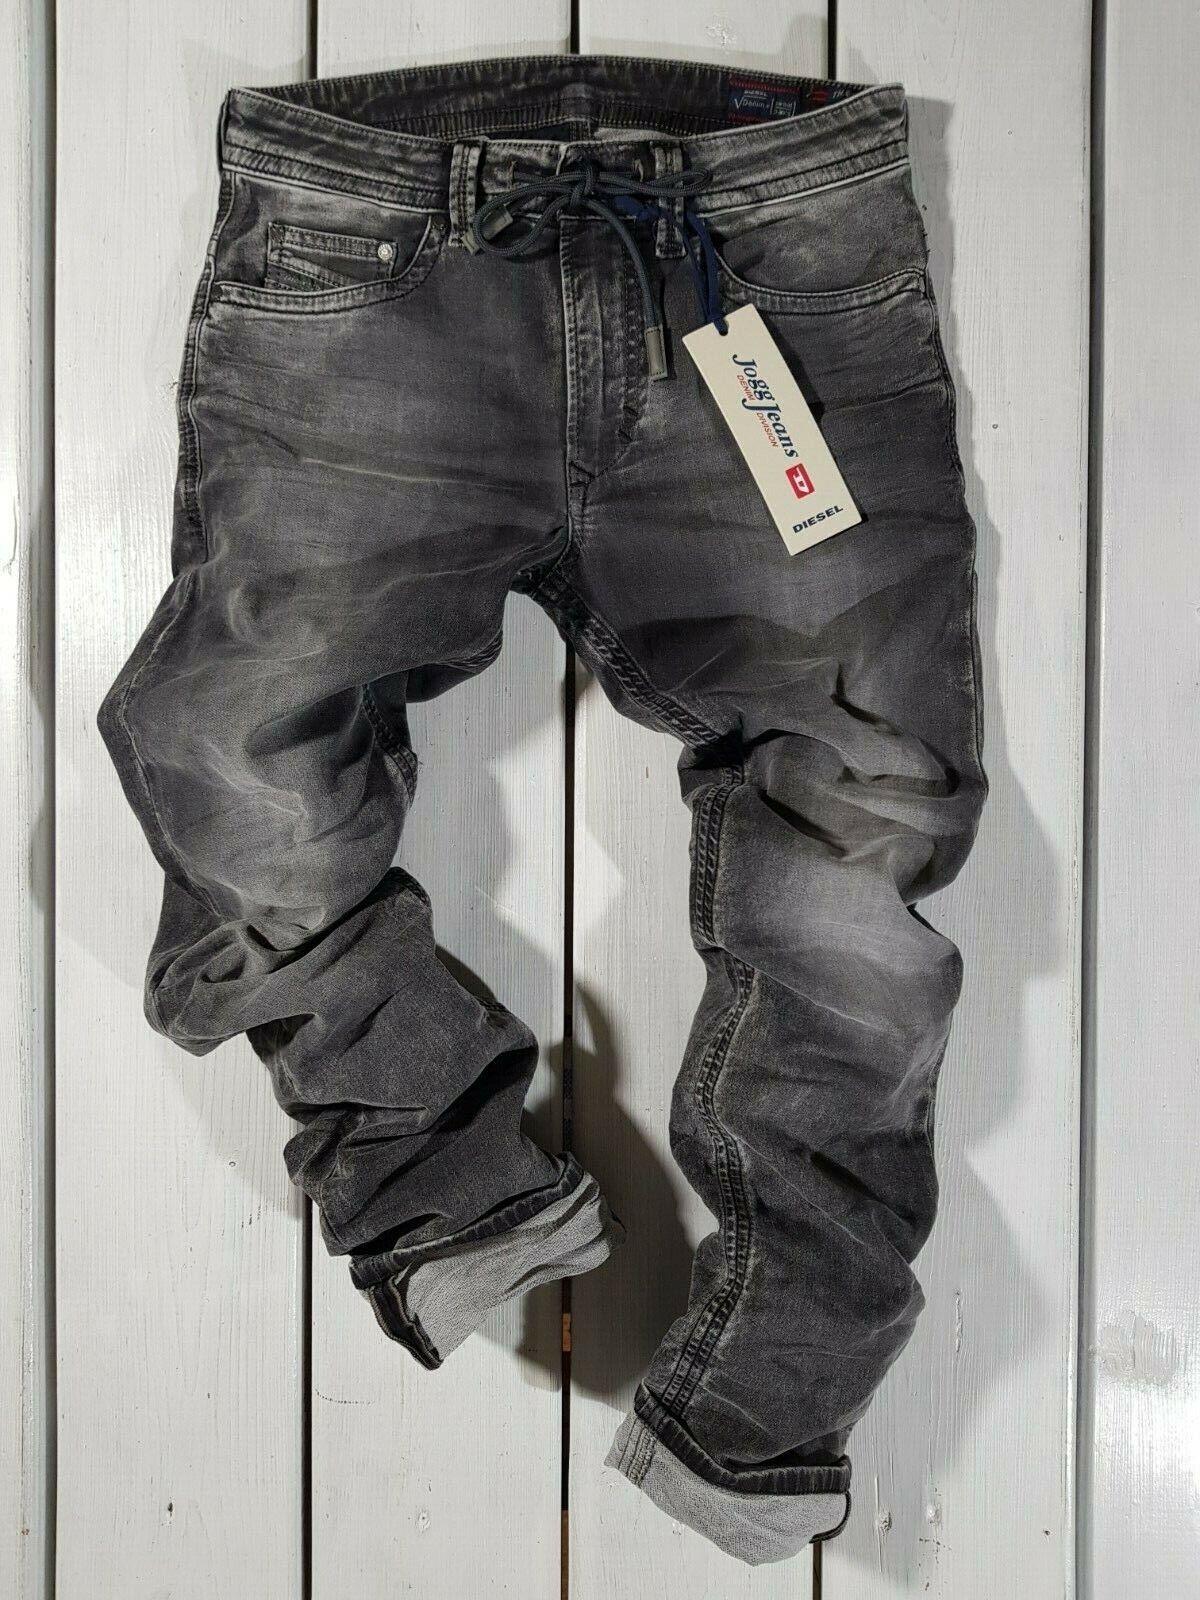 New Diesel Men's Jeans Thavar SP-NE 0855B Denim + Sweat Pants Jogg RRP